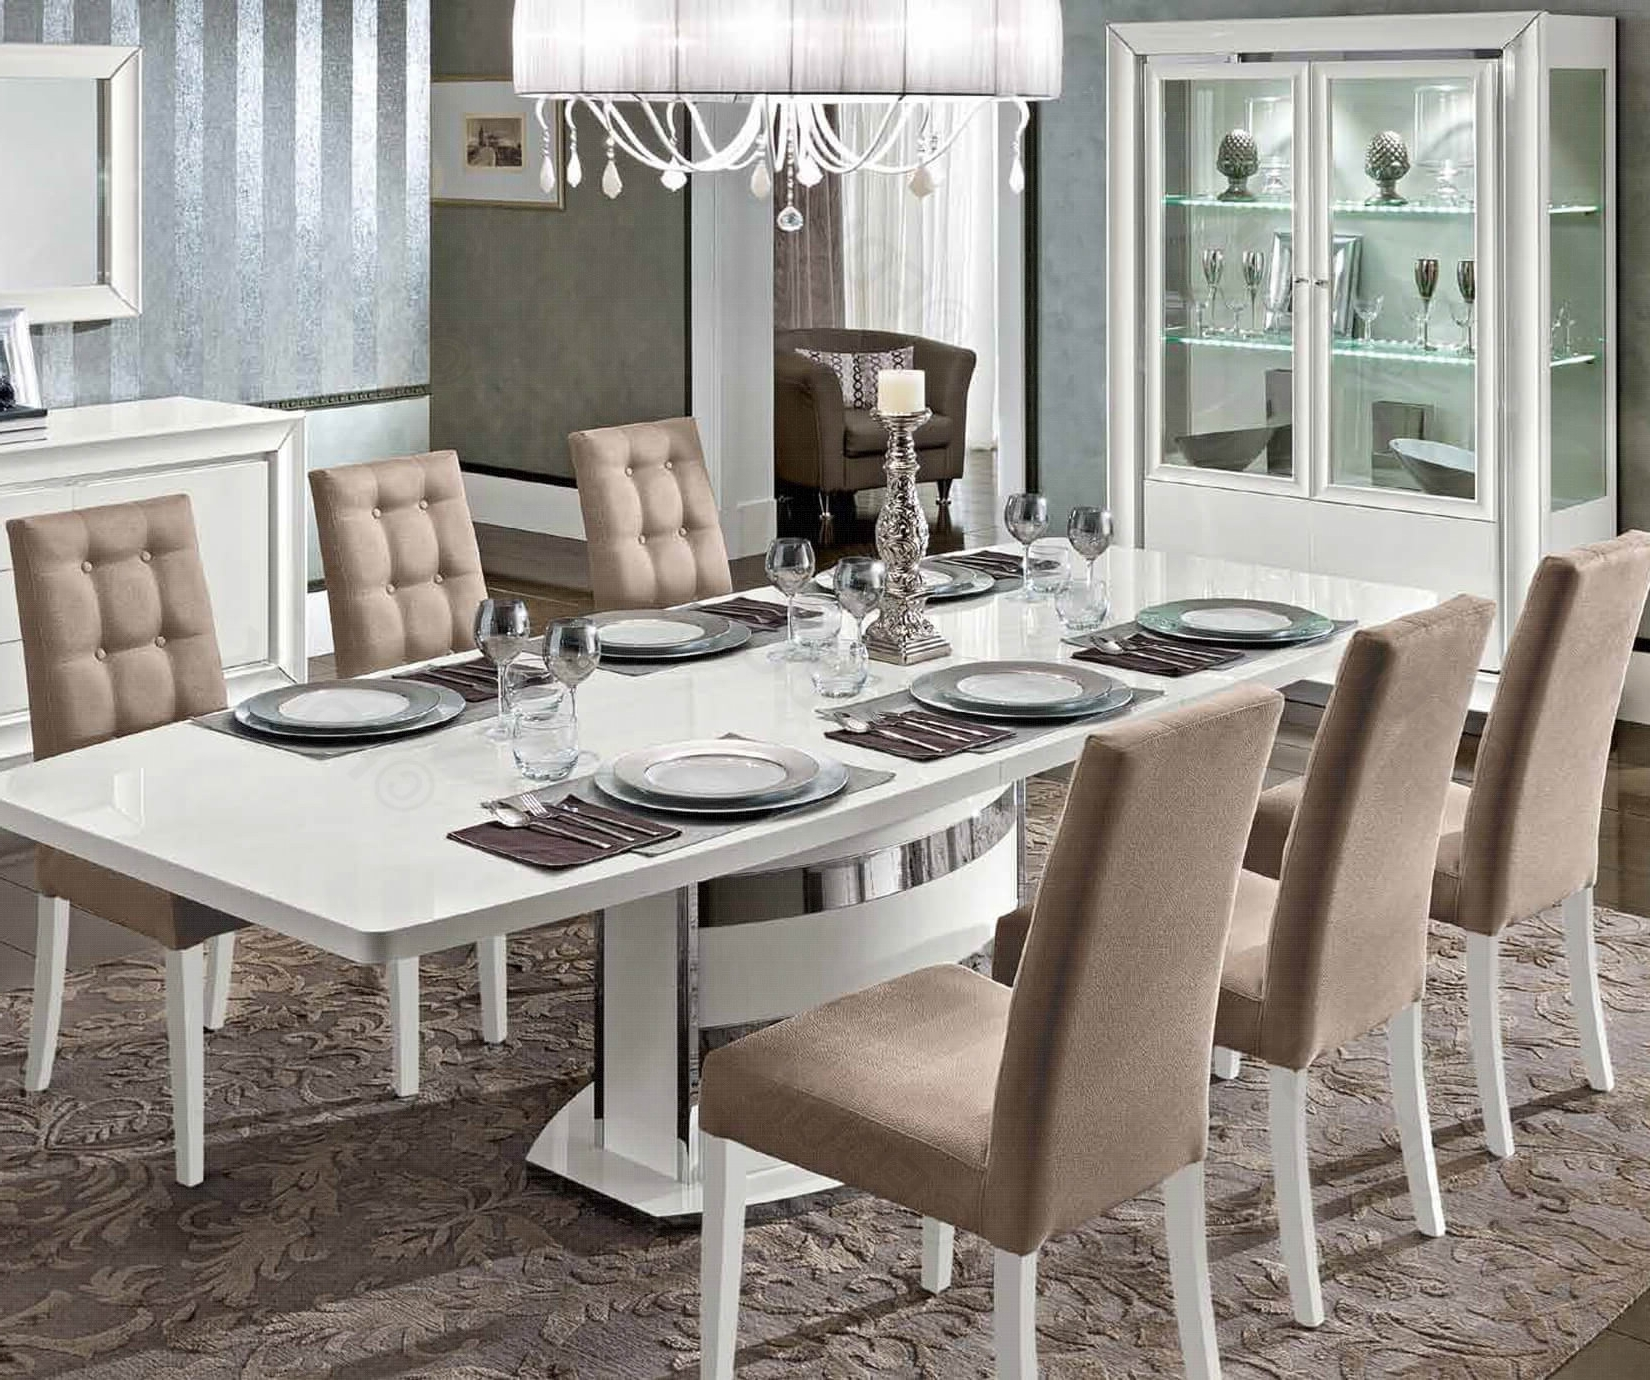 Dama Bianca White High Gloss Extending Pertaining To Recent High Gloss Extending Dining Tables (View 7 of 25)